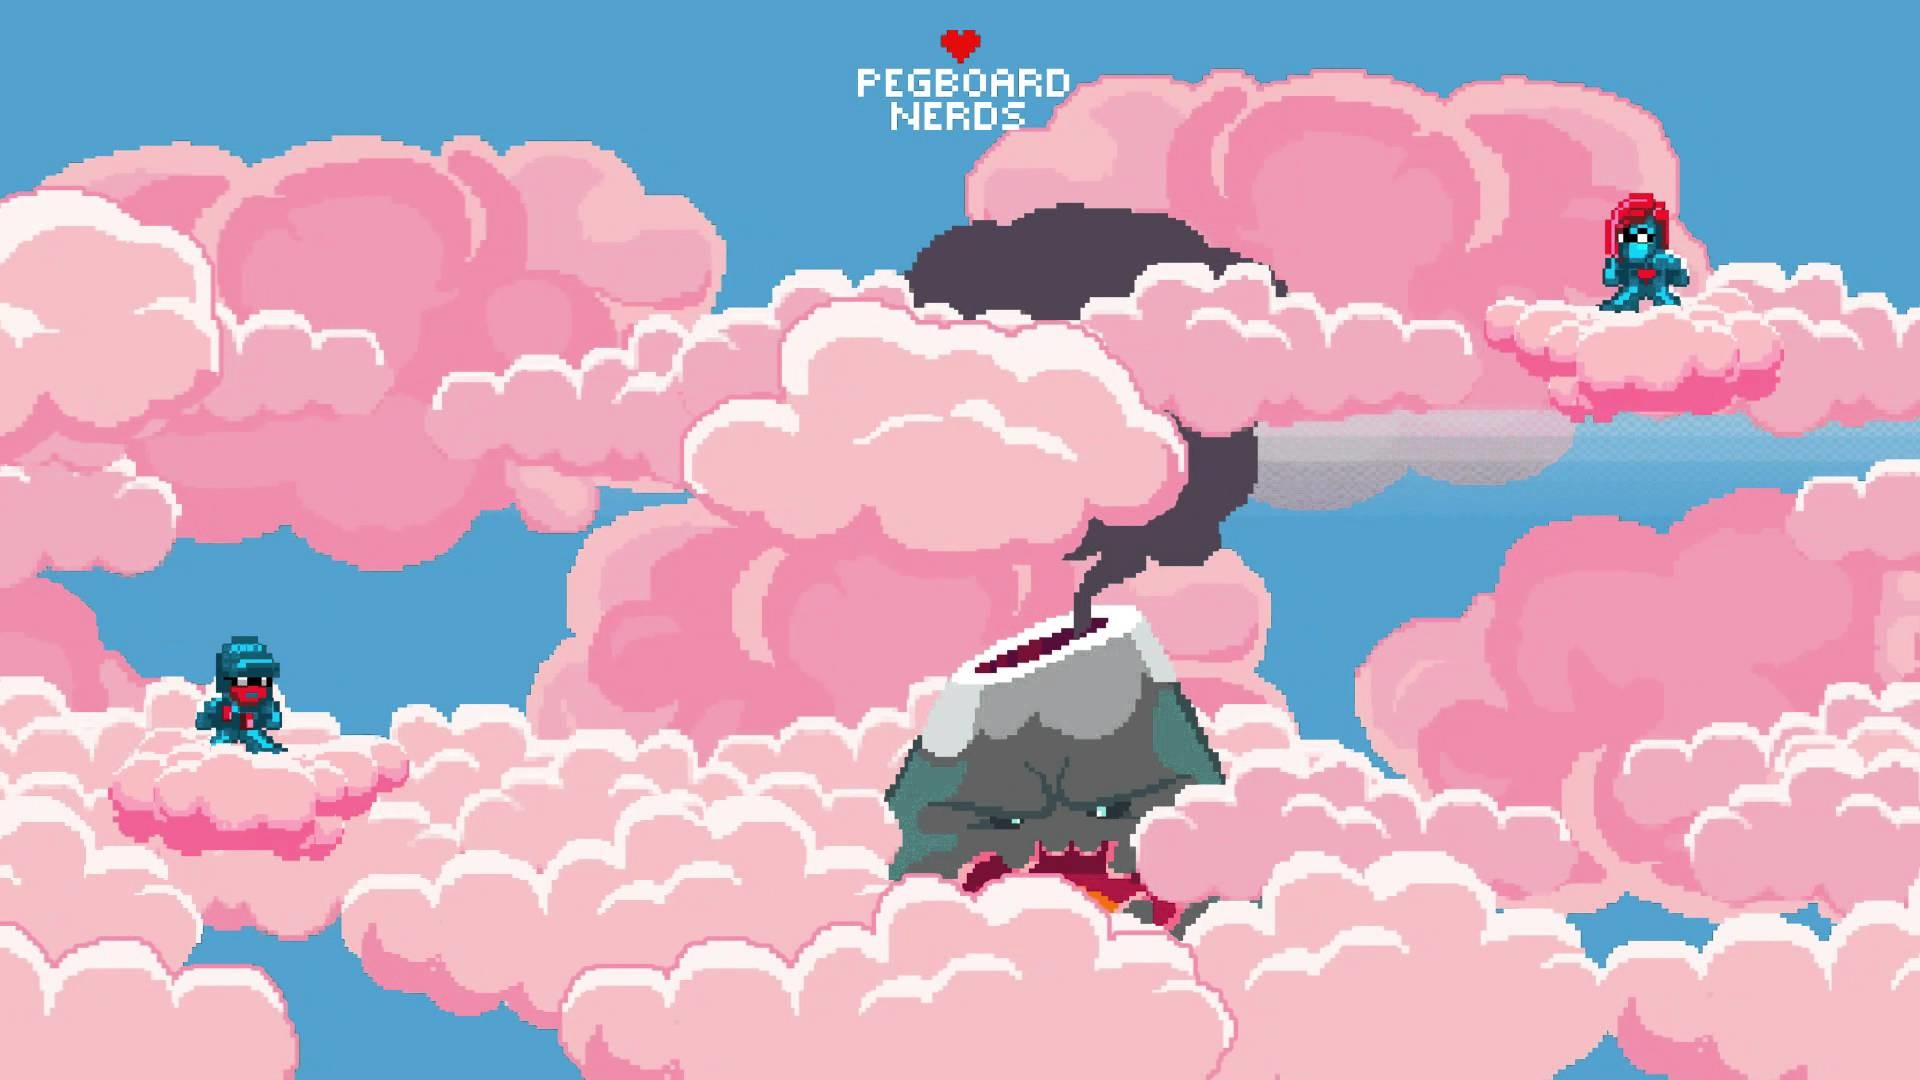 pink cloud pegboard nerds – Google Search